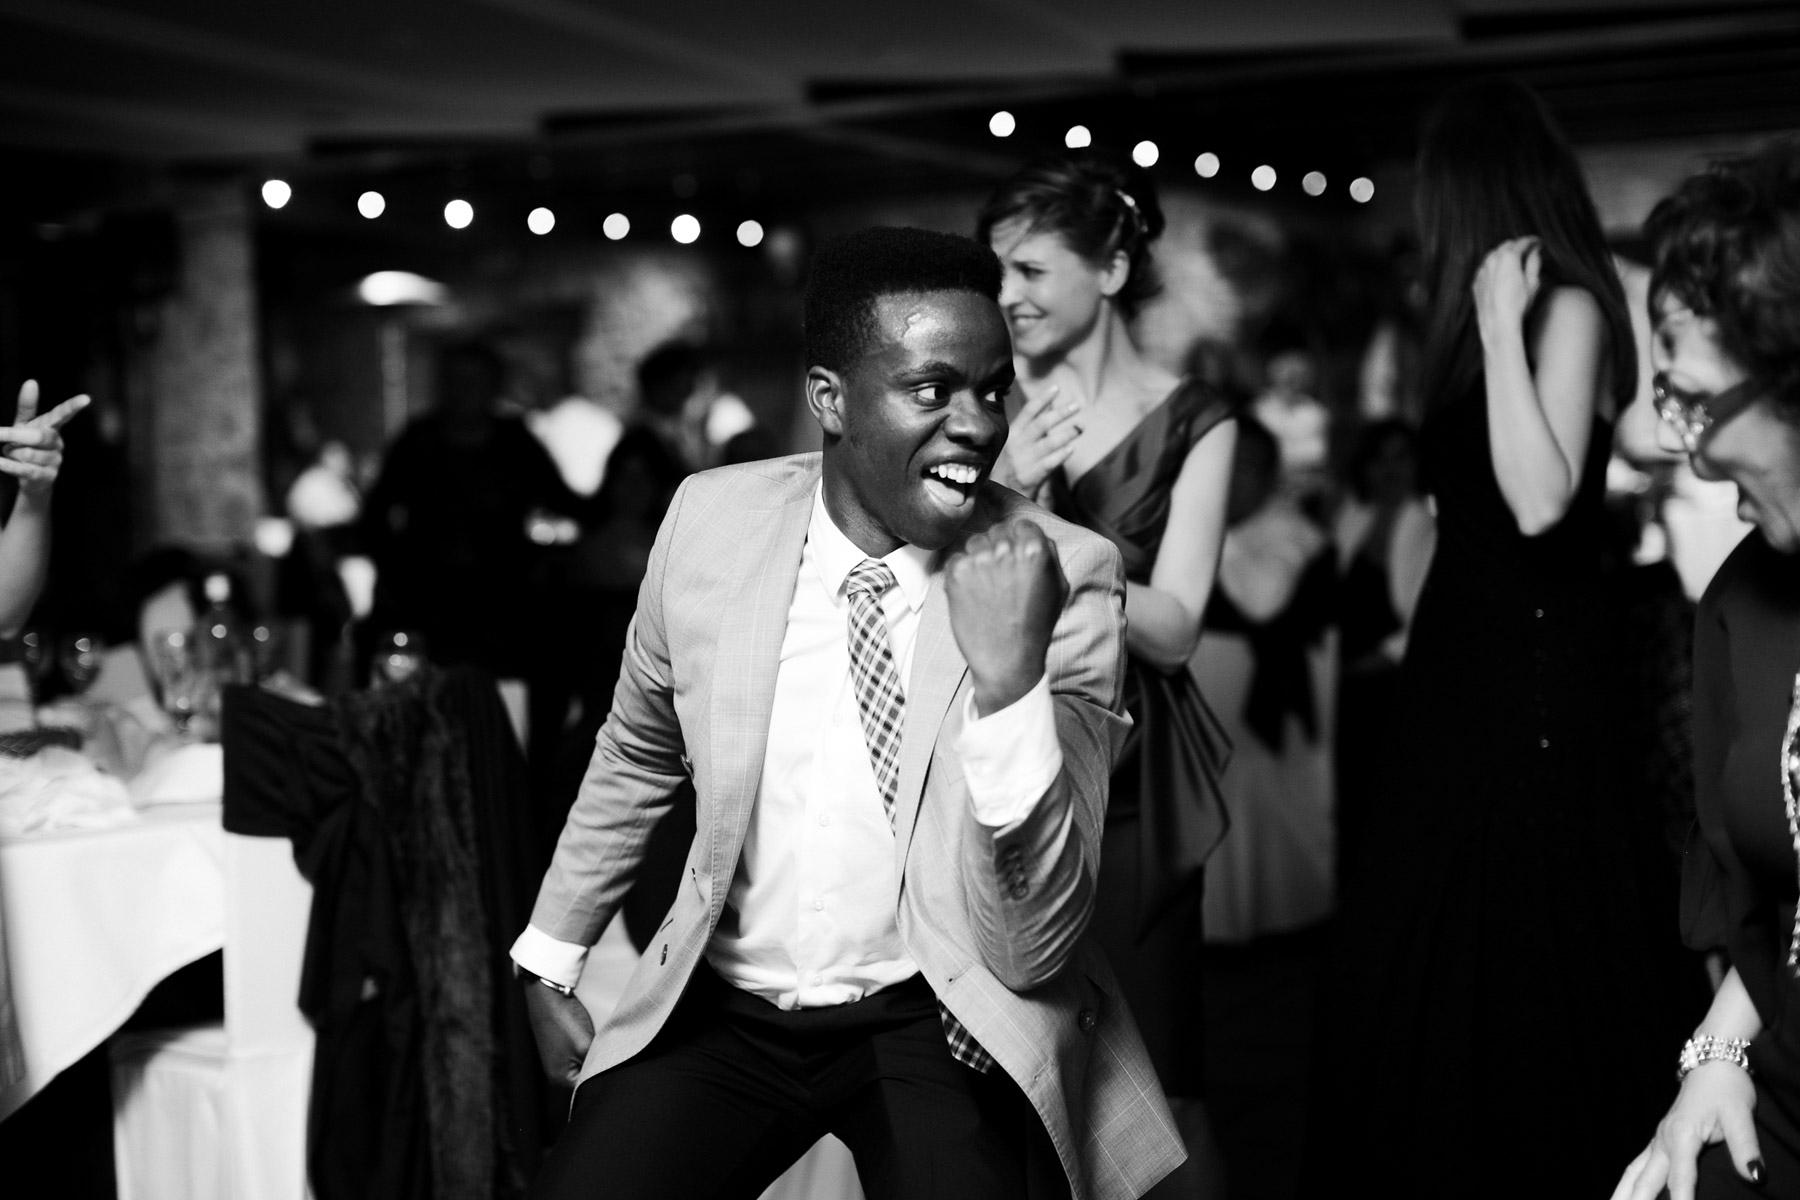 fotografo de bodas Jairo Crena-188